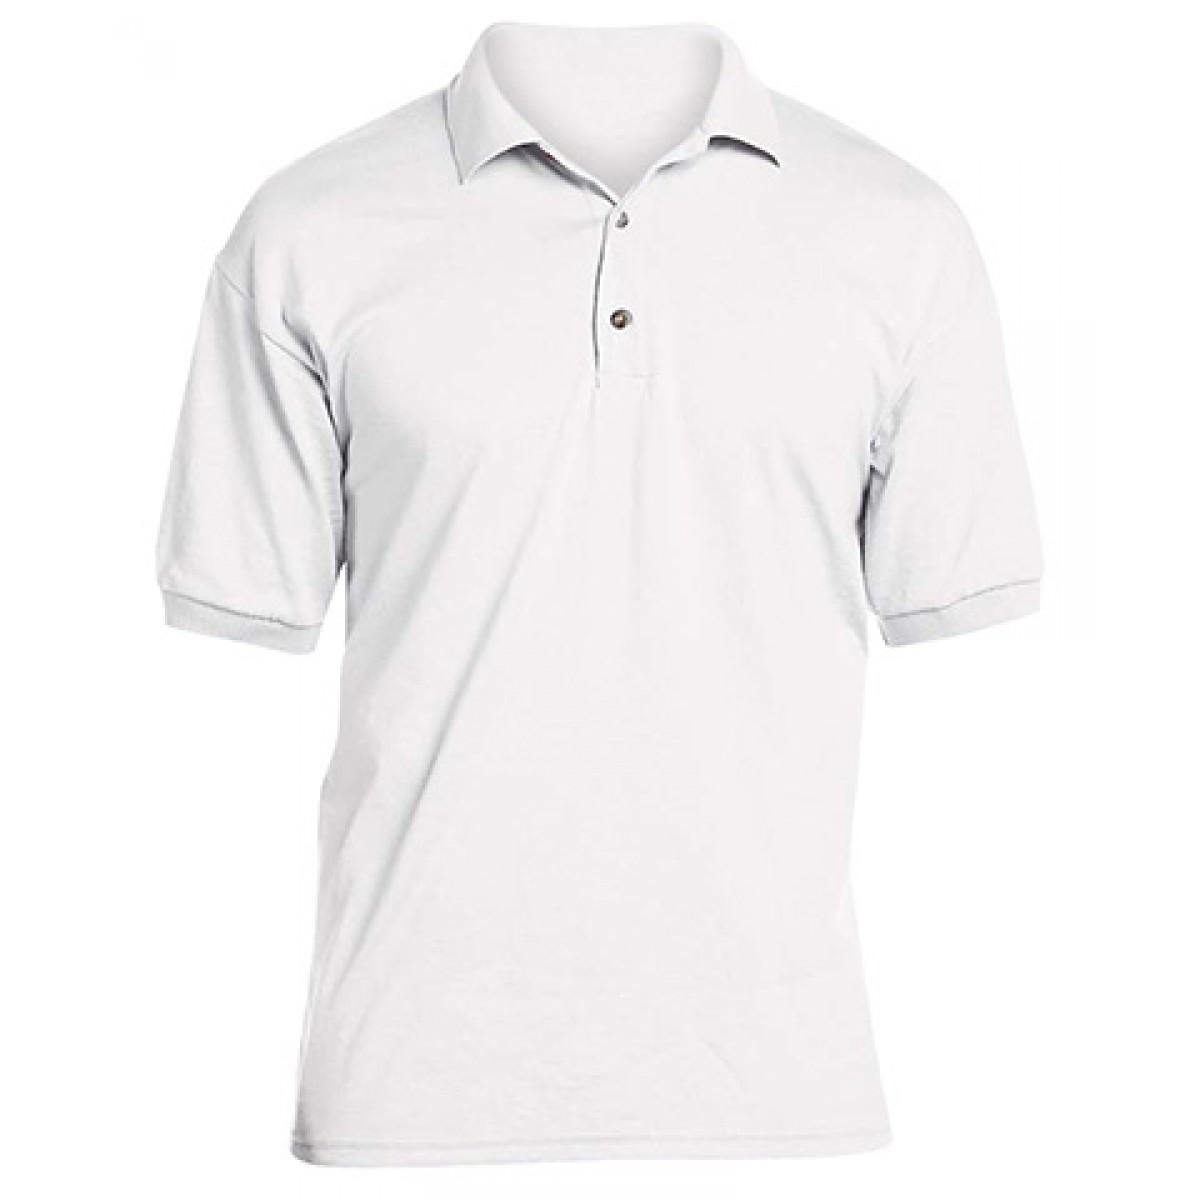 Jersey Polo 50/50